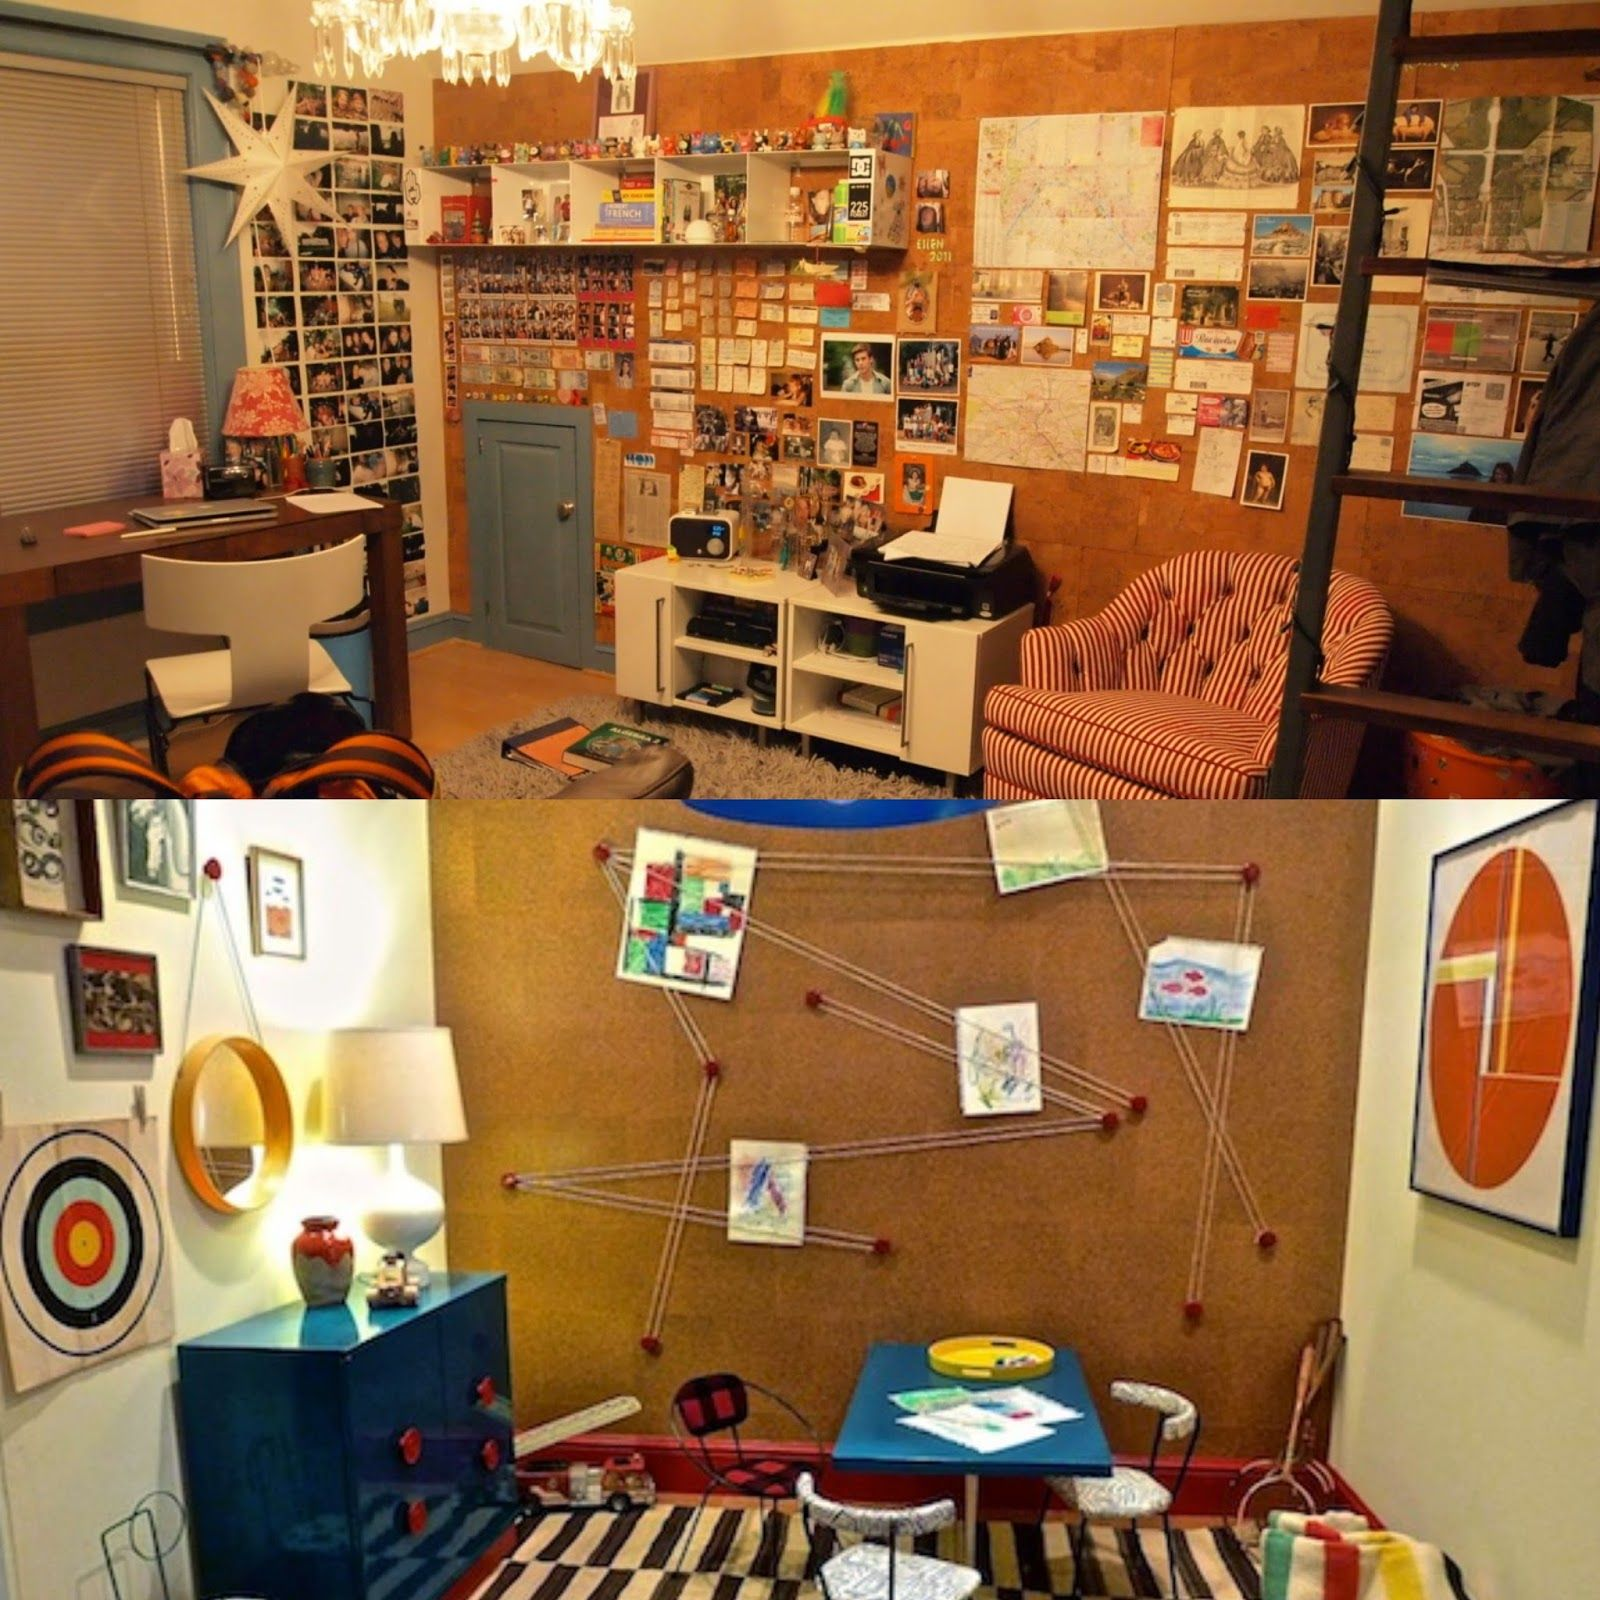 Mural De Corti A Tumblr Pesquisa Google Painel Tcc  ~ Mural De Fotos Na Parede Do Quarto